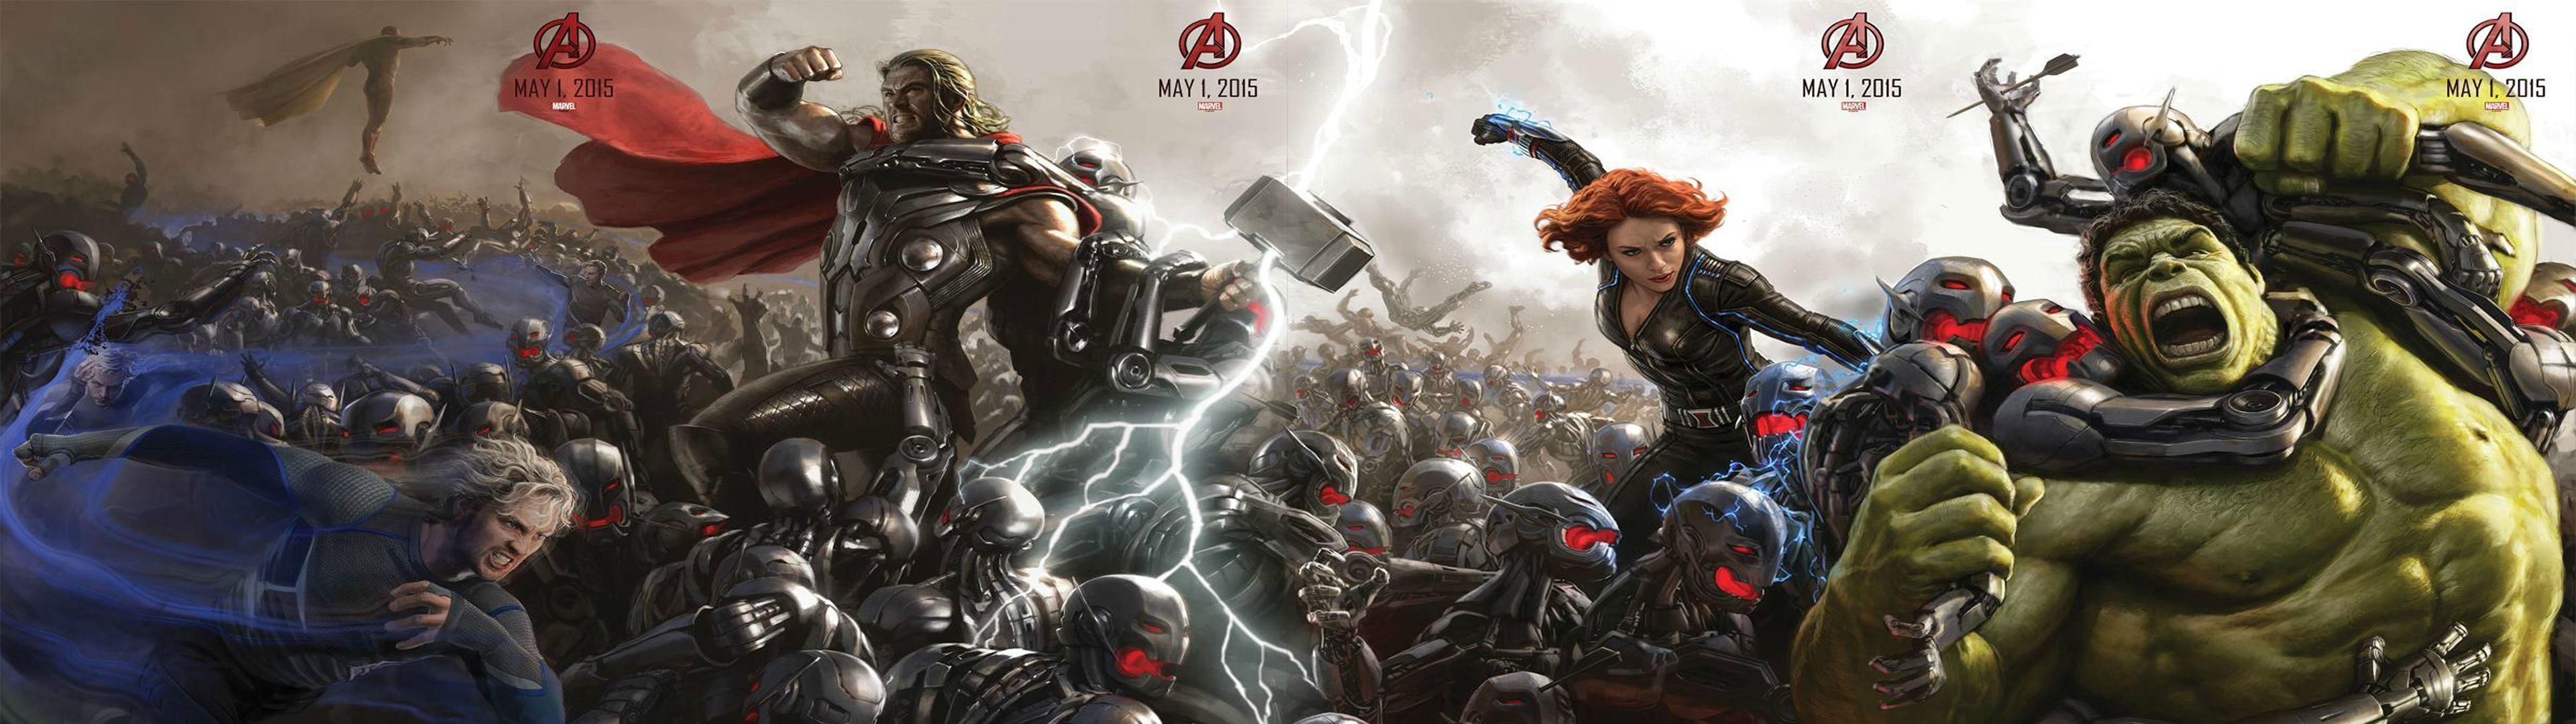 Avengers Dual Screen Wallpapers Top Free Avengers Dual Screen